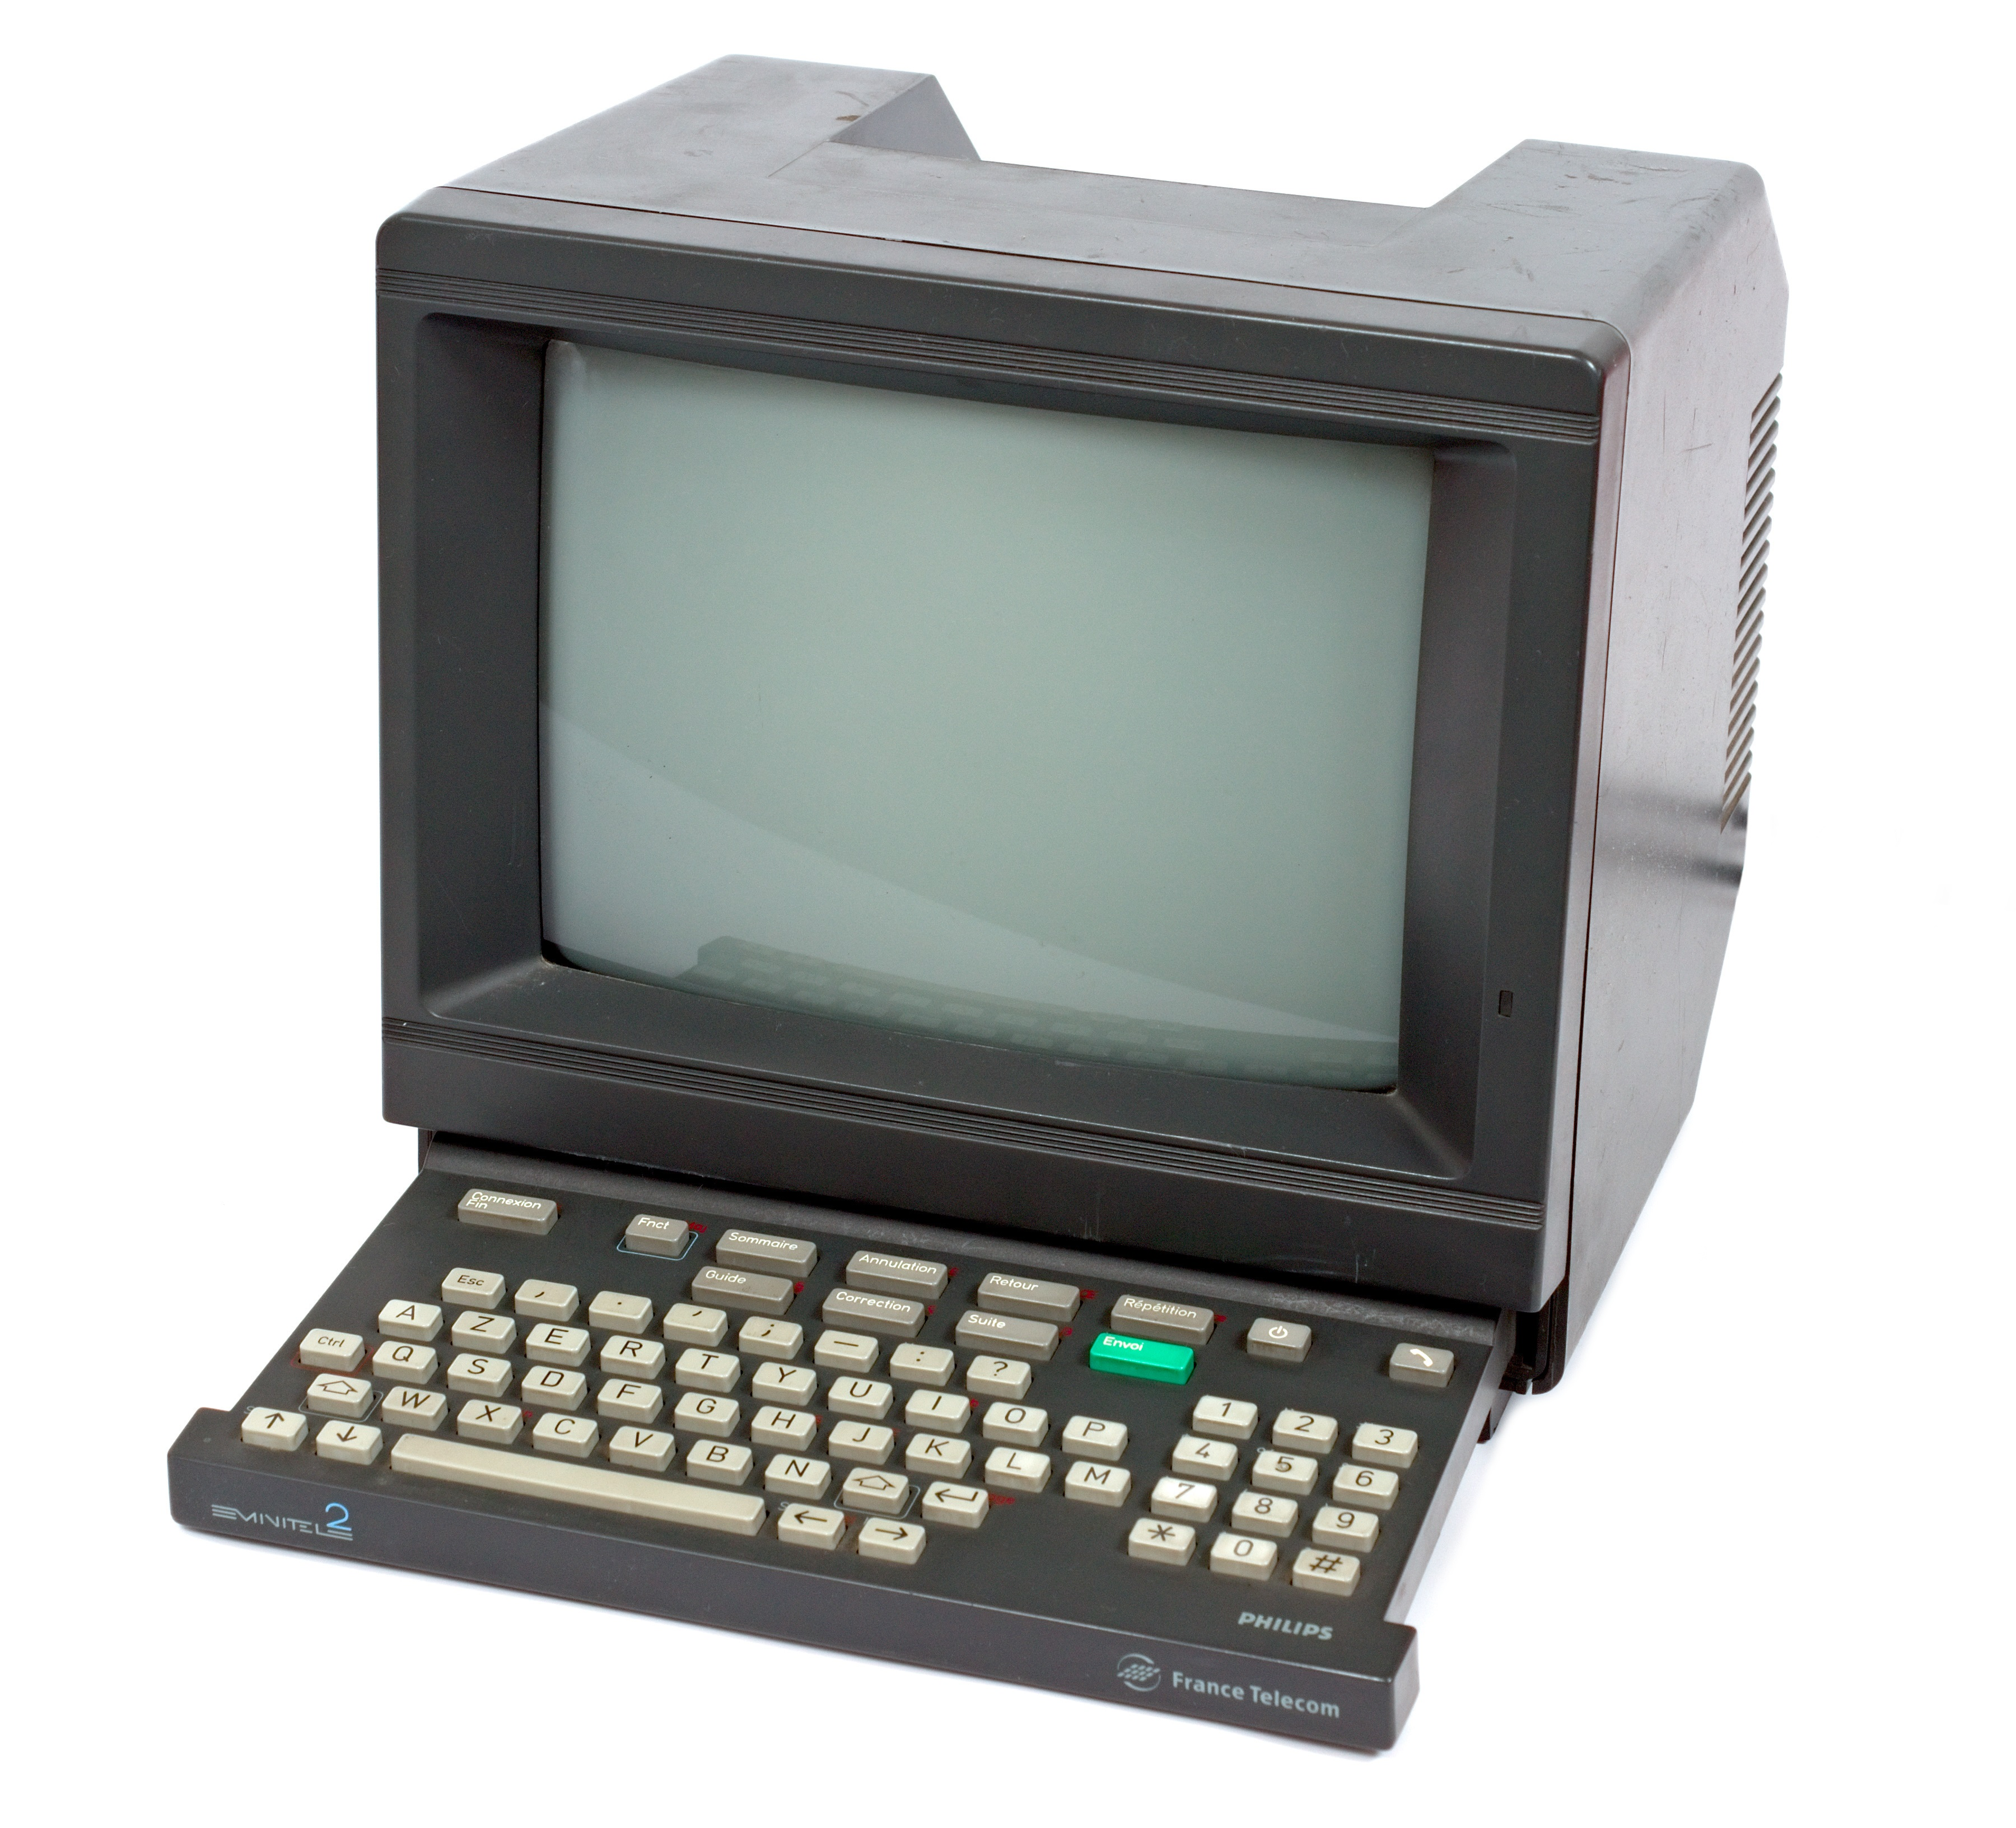 fichierminitel 2 15545314182jpg � wikip233dia